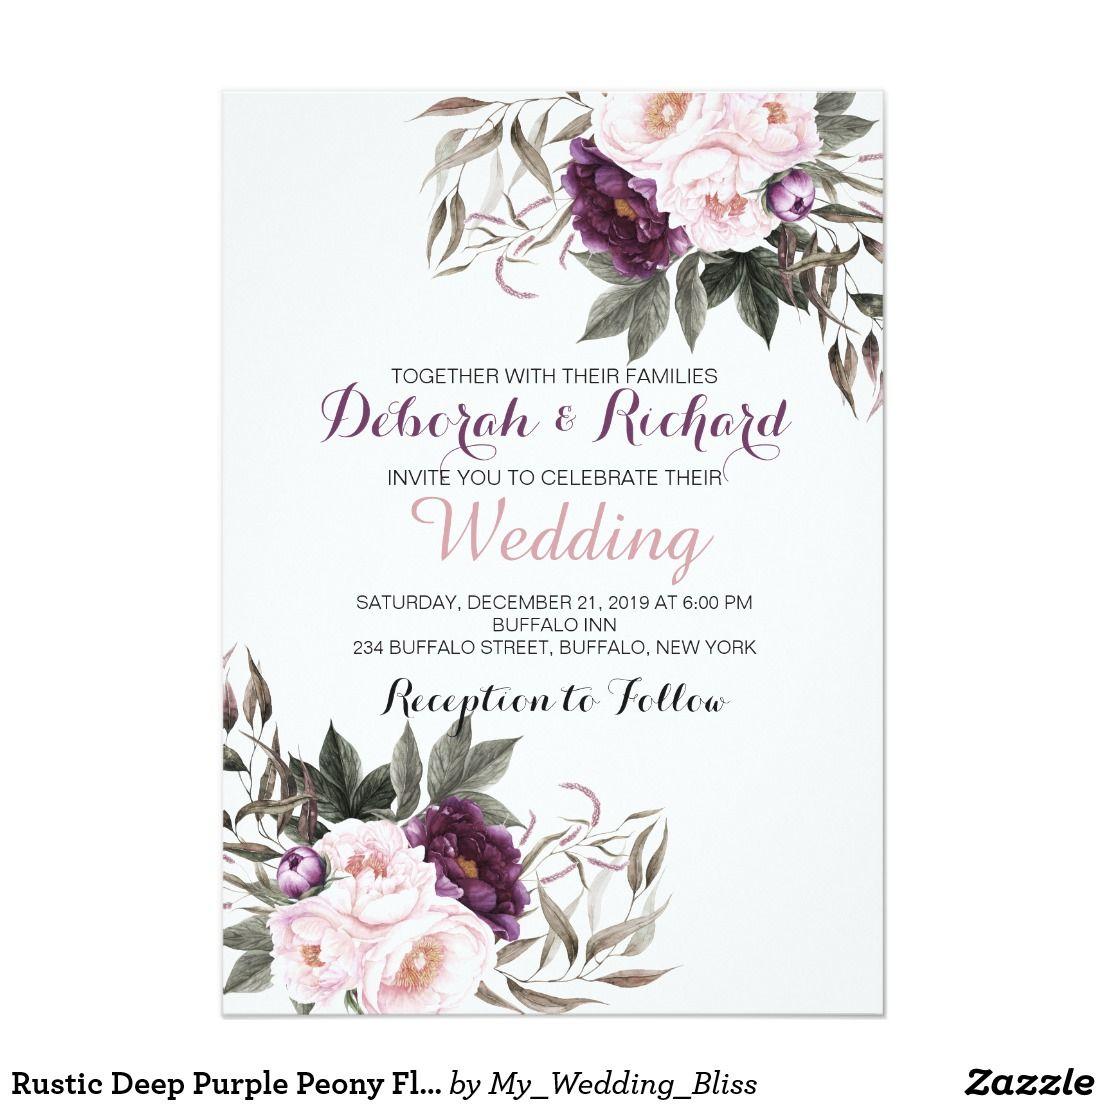 Purple Rustic Wedding Invitations: Rustic Deep Purple Peony Floral Wedding Card